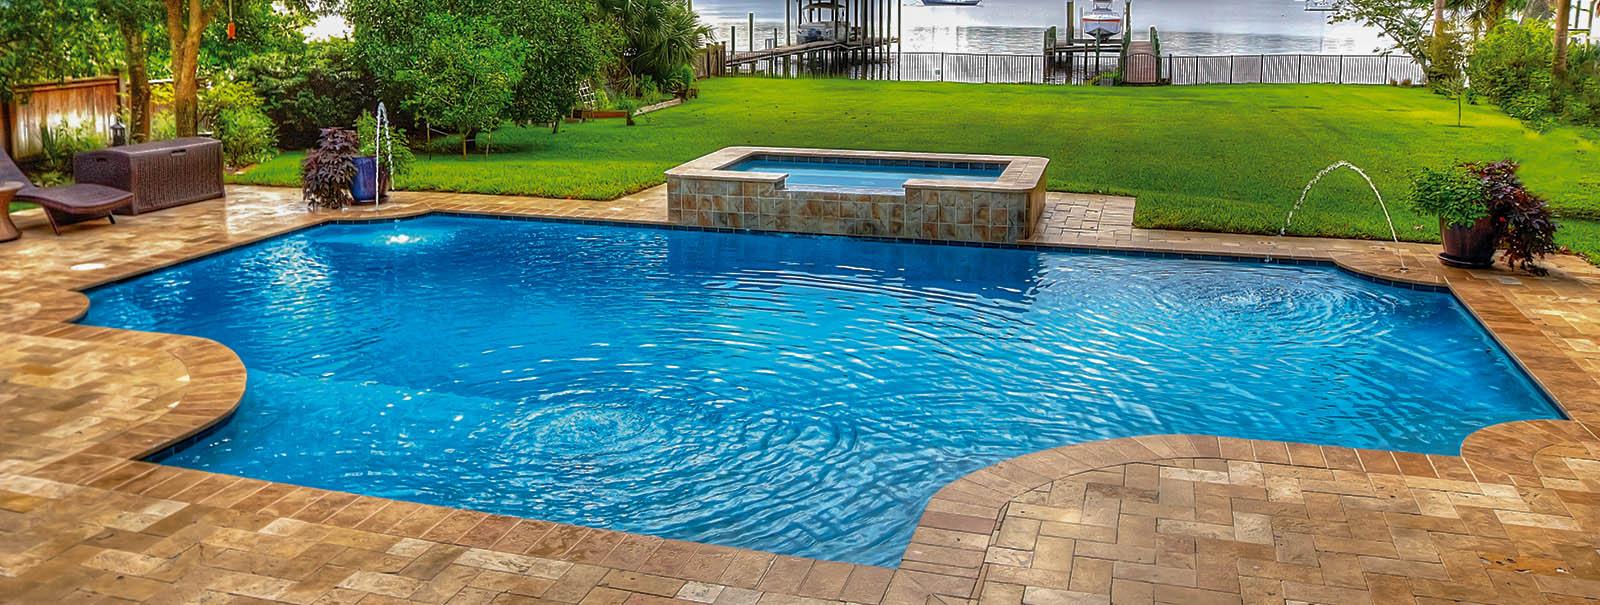 Jacksonville custom swimming pool builders blue haven pools for Custom inground swimming pools